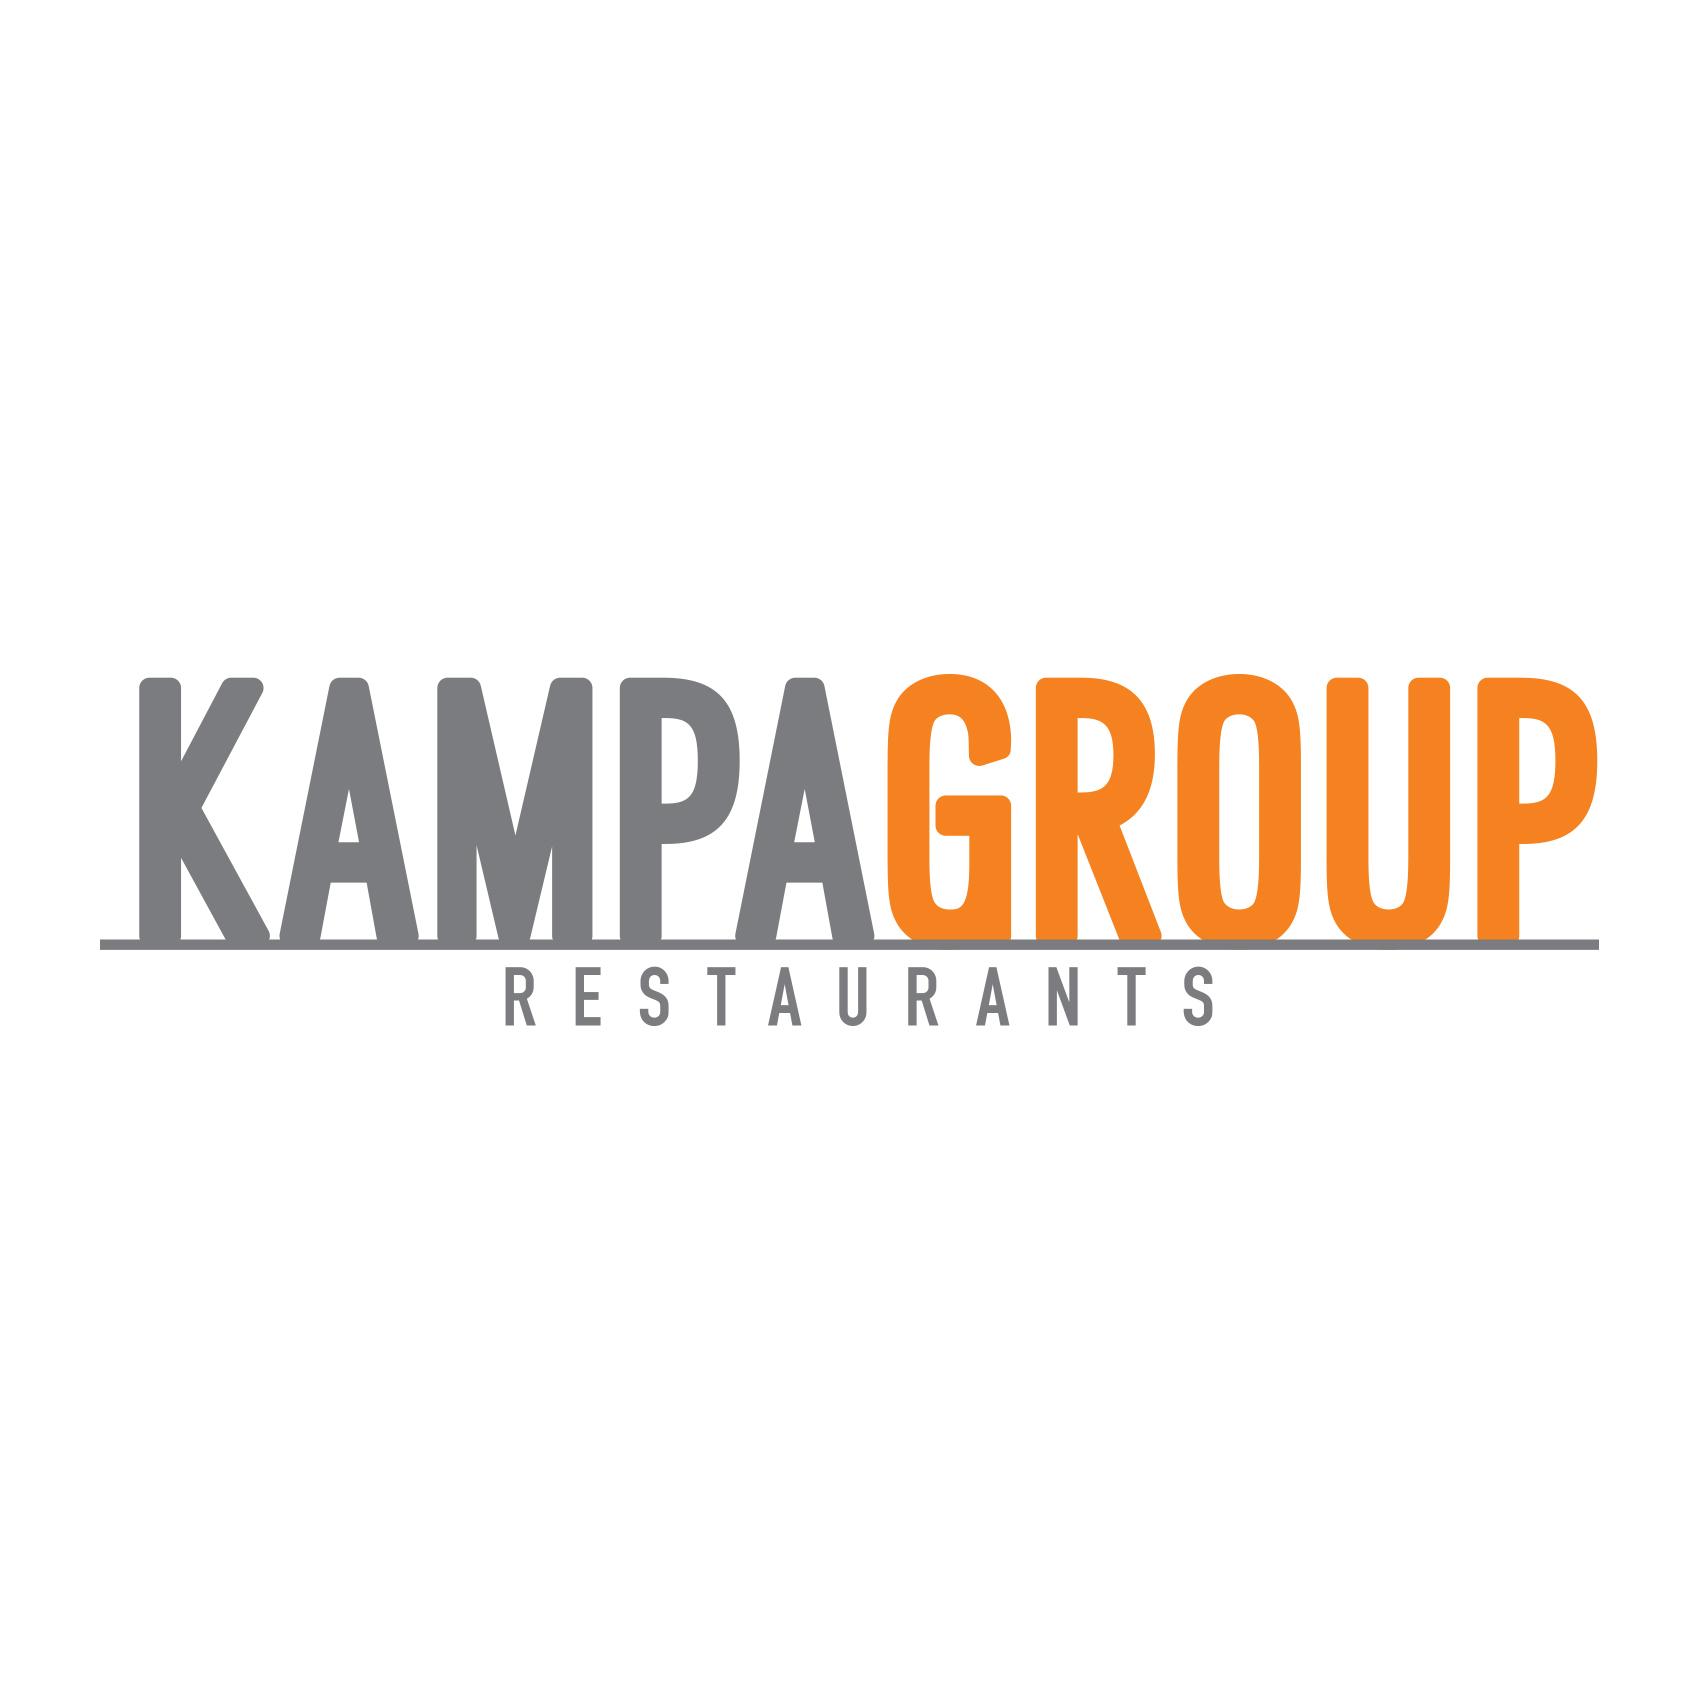 Kampa Group